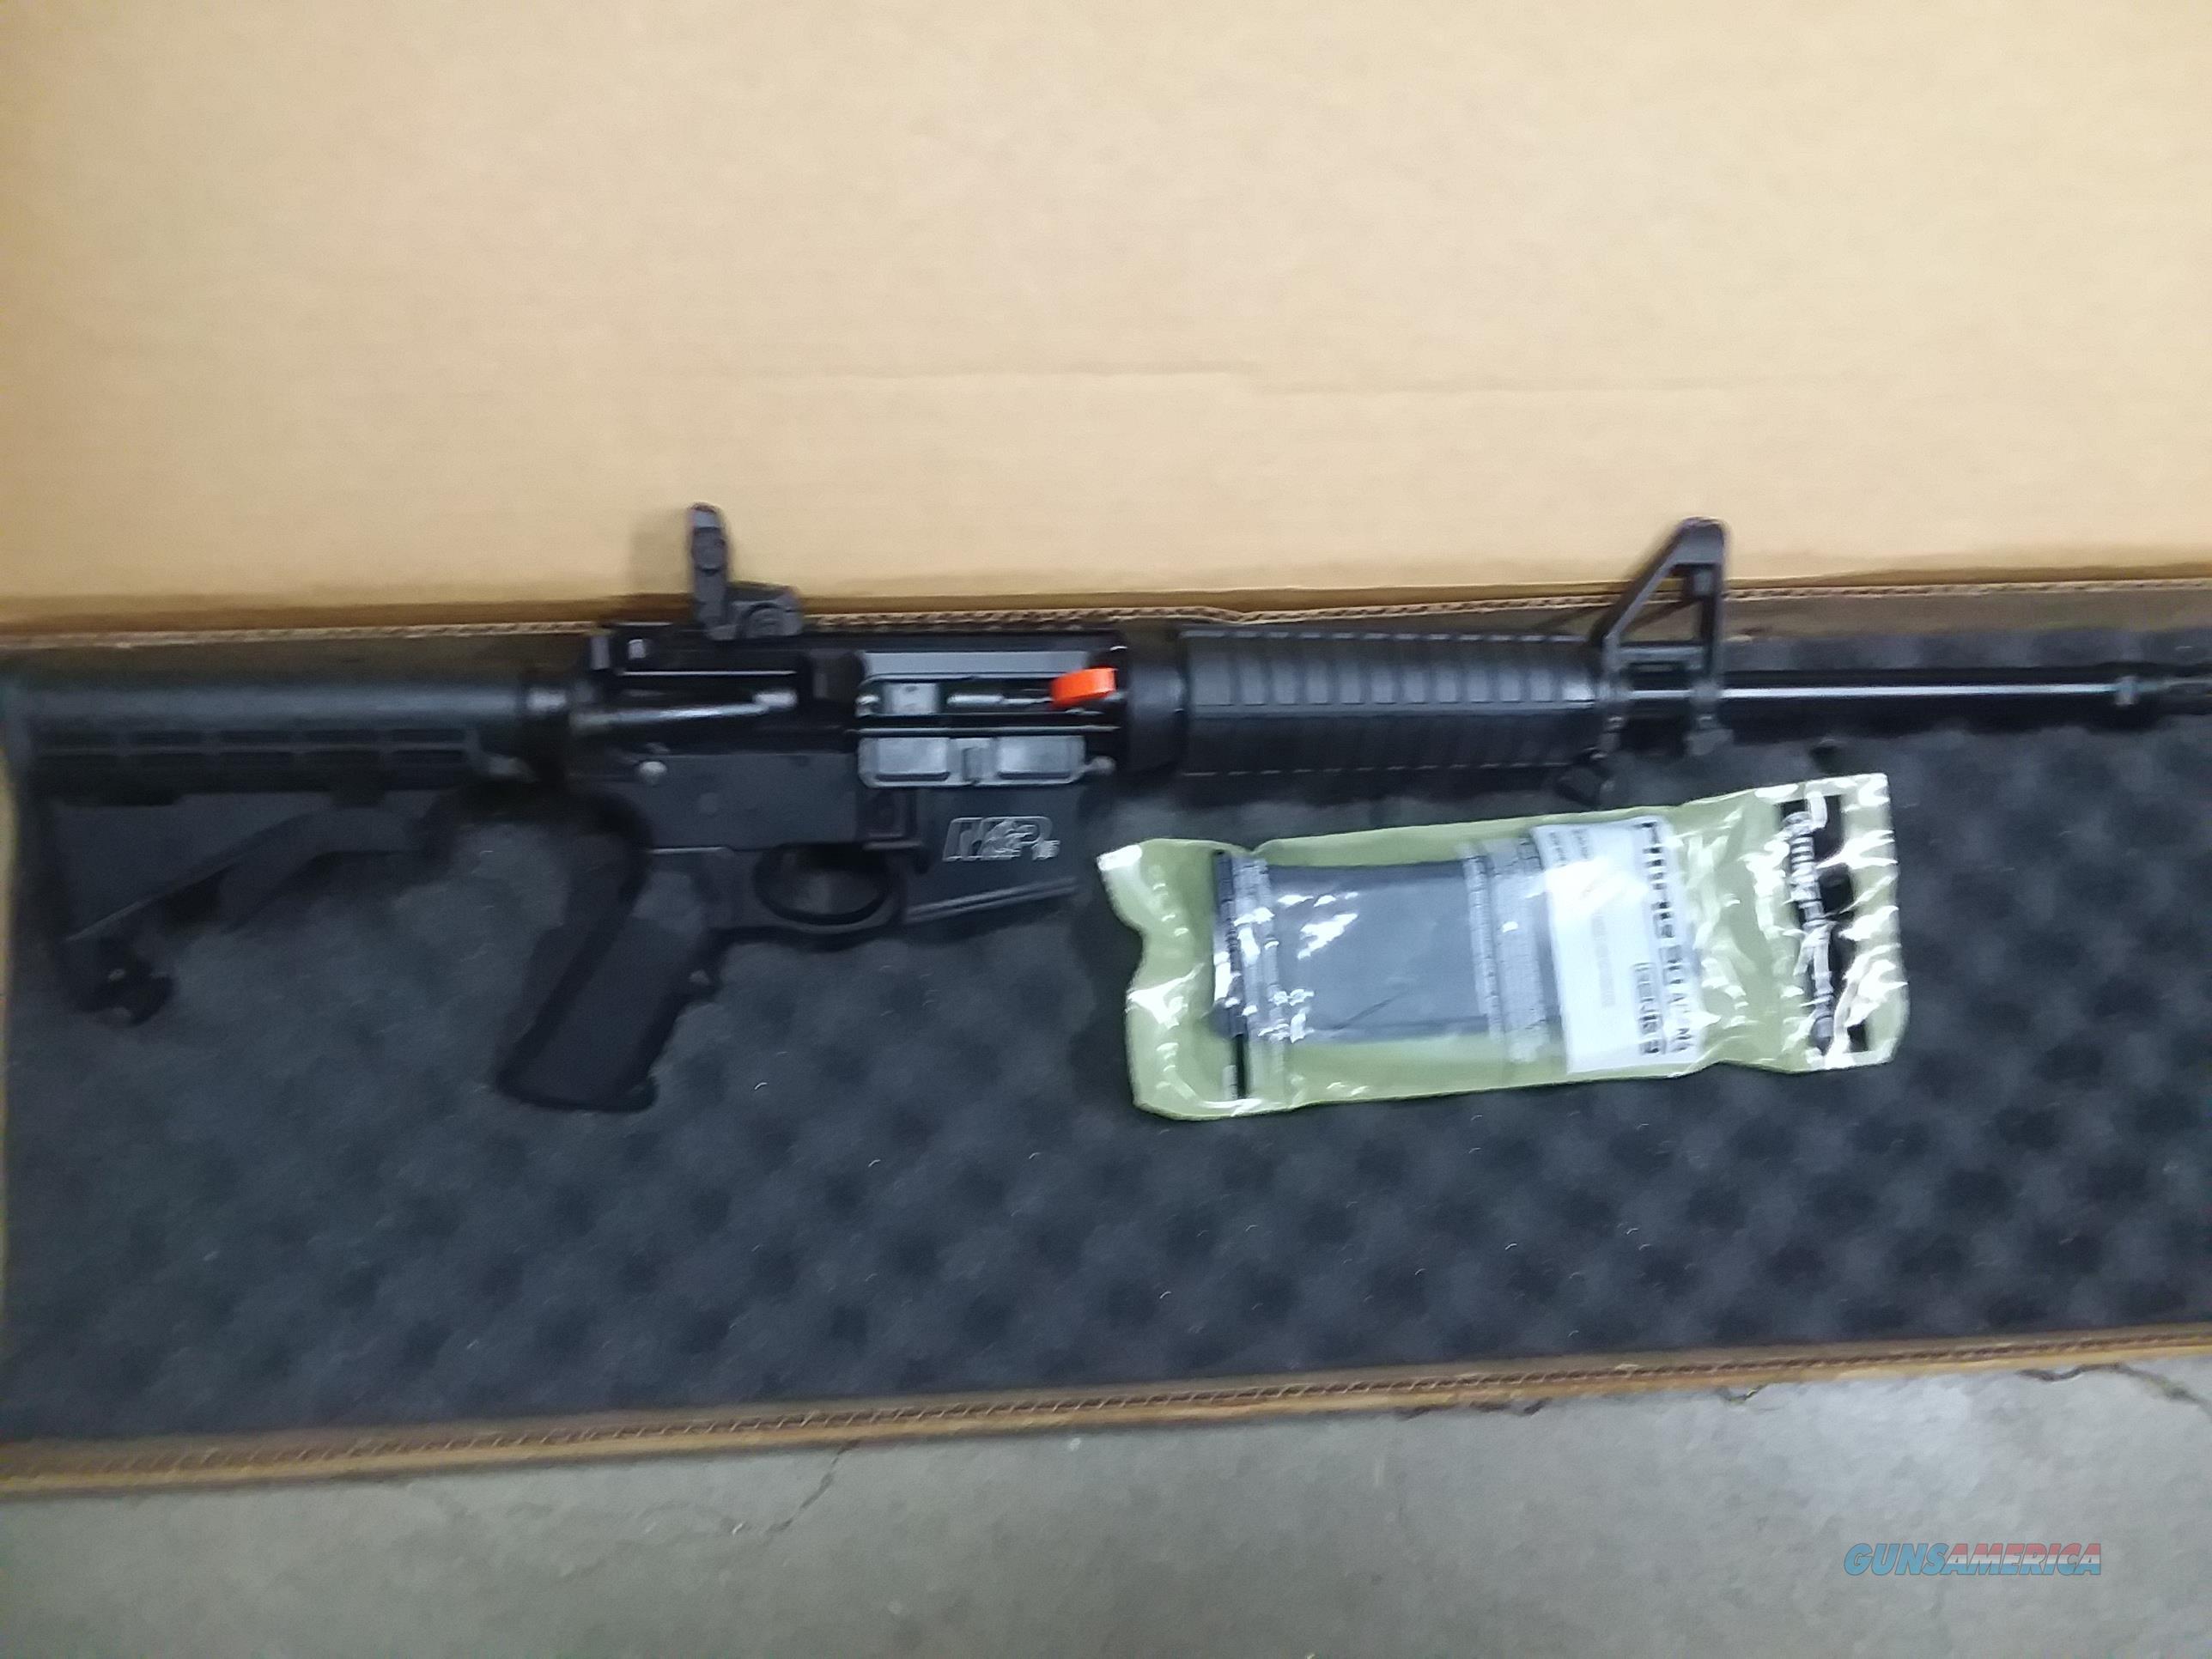 M & P 15 Sport II 5.56 MM  Guns > Rifles > Smith & Wesson Rifles > M&P